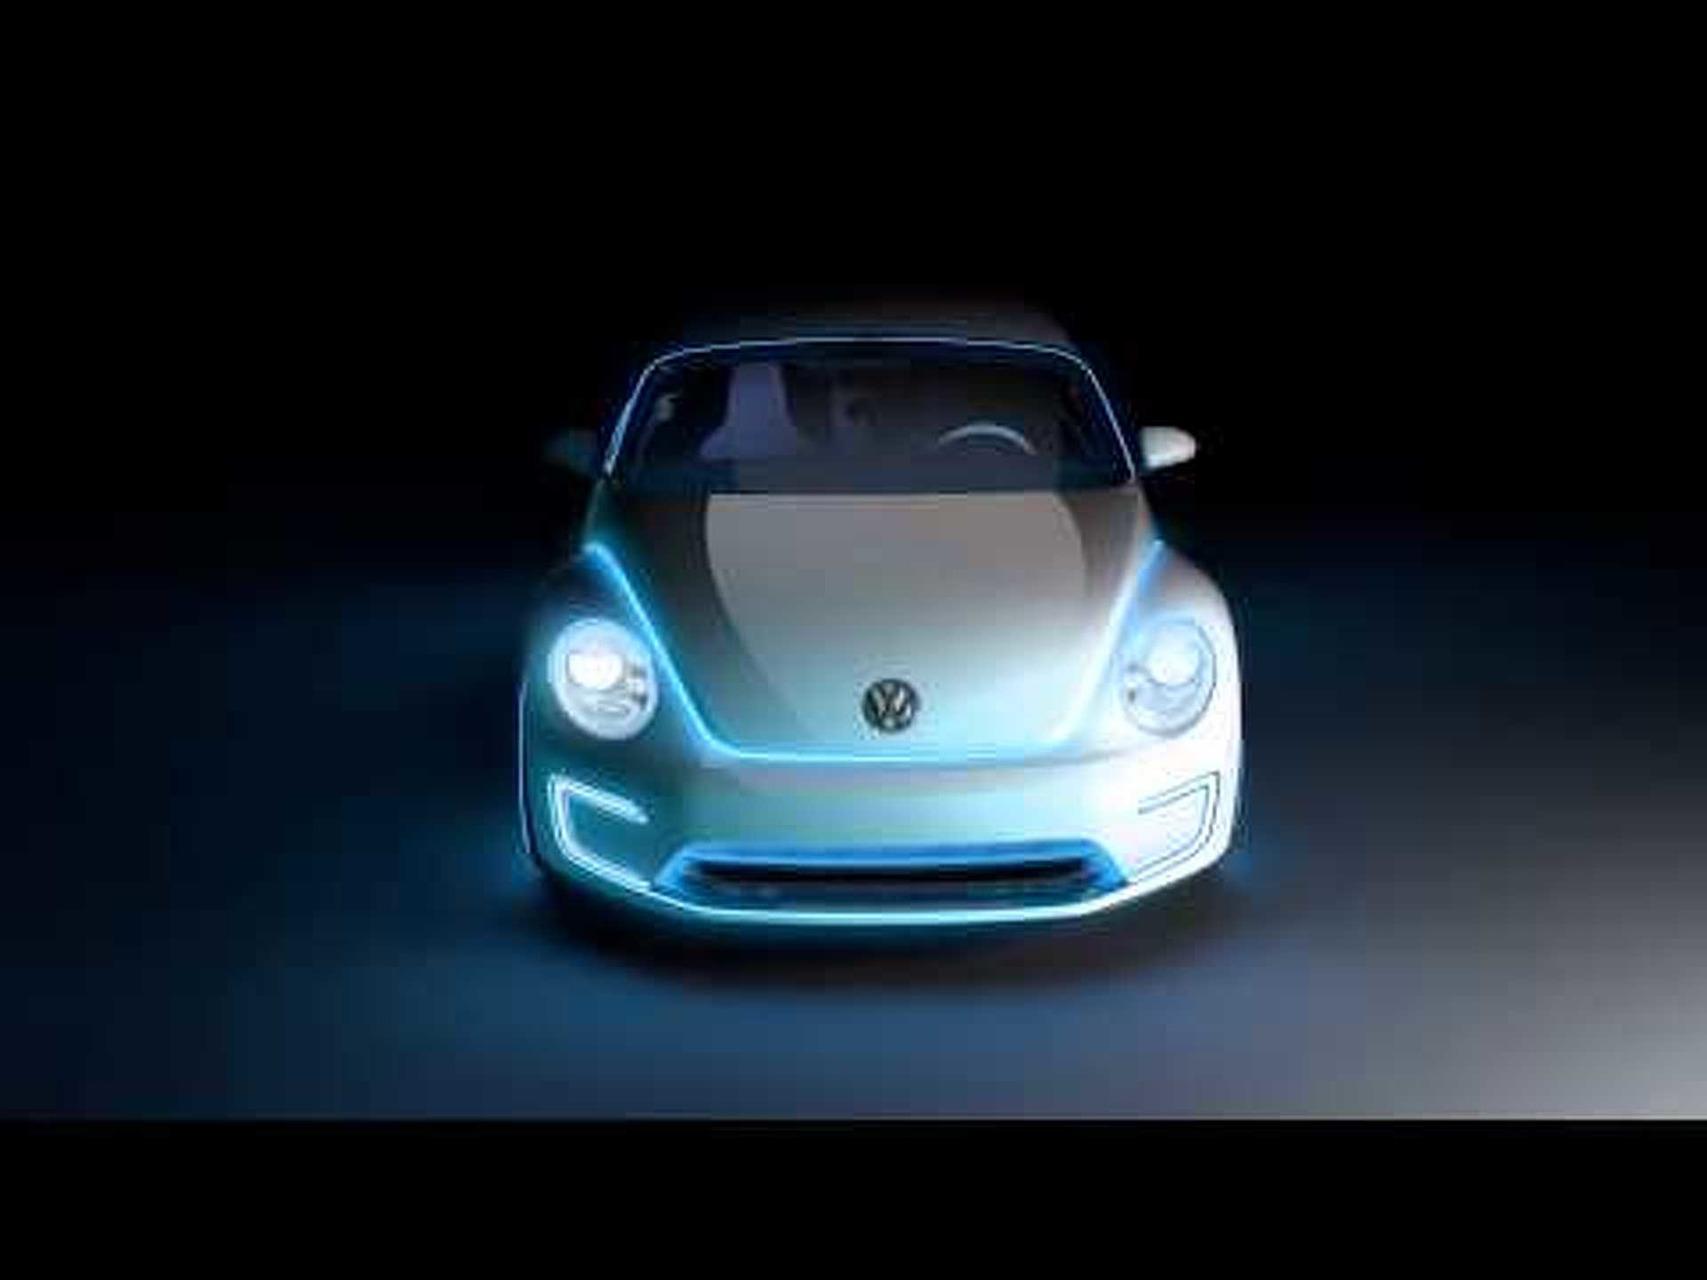 2012 Volkswagen E-Bugster Concept Promo